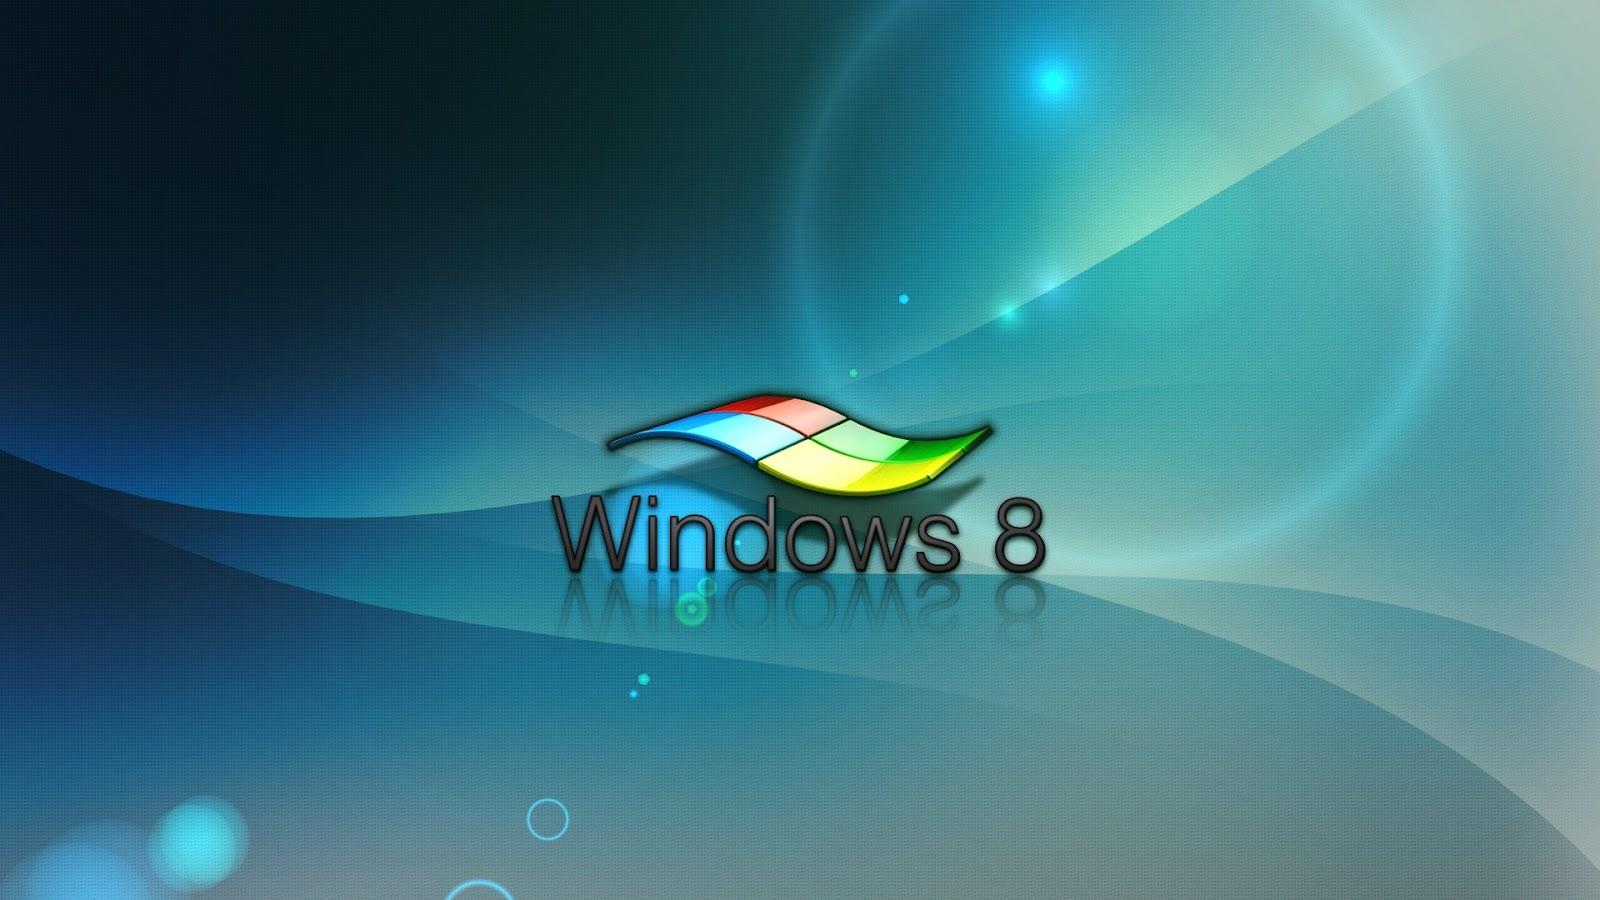 Revolution Wallpaper Windows 8 HD Wallpapers 1080p 1600x900